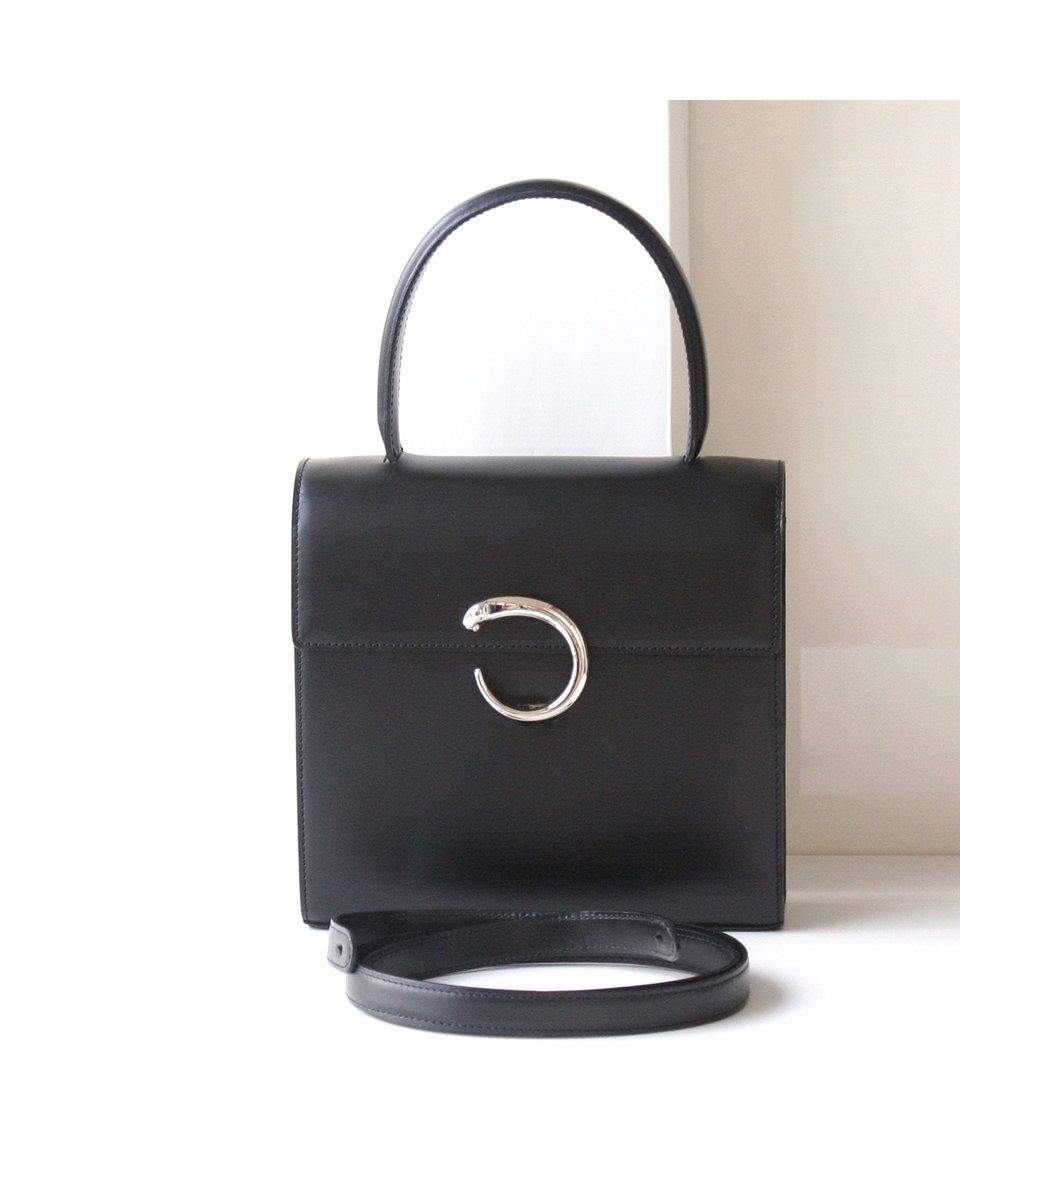 35690ffe949d Authentic Gianni Versace Couture Violet Crocodile Leather Sholder Vintage  handbag ( 850) found on Polyvore featuri…